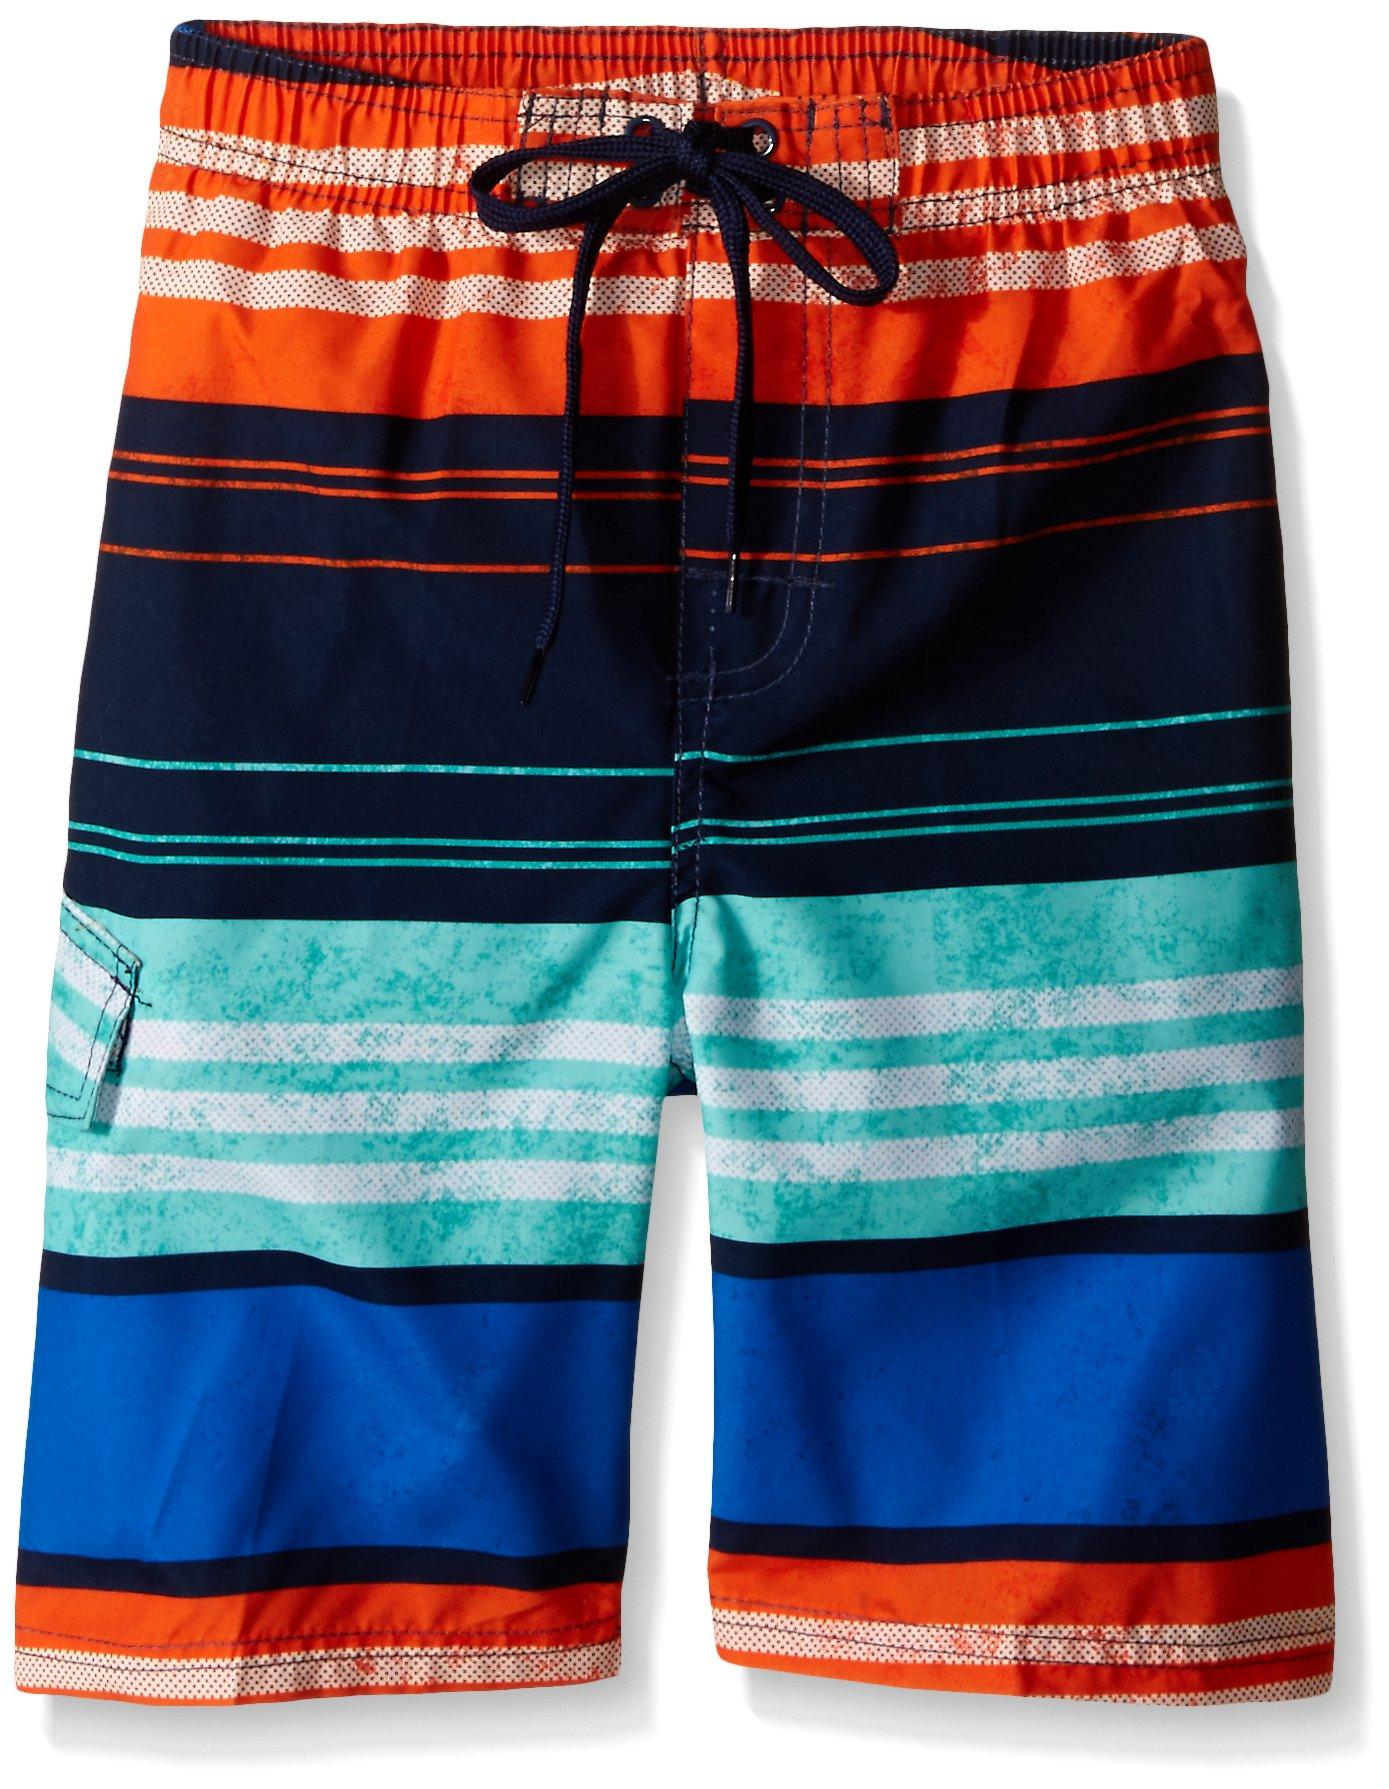 Kanu Surf Little Boys' Halo Stripe Swim Trunk, Navy/Orange, Medium (5/6)